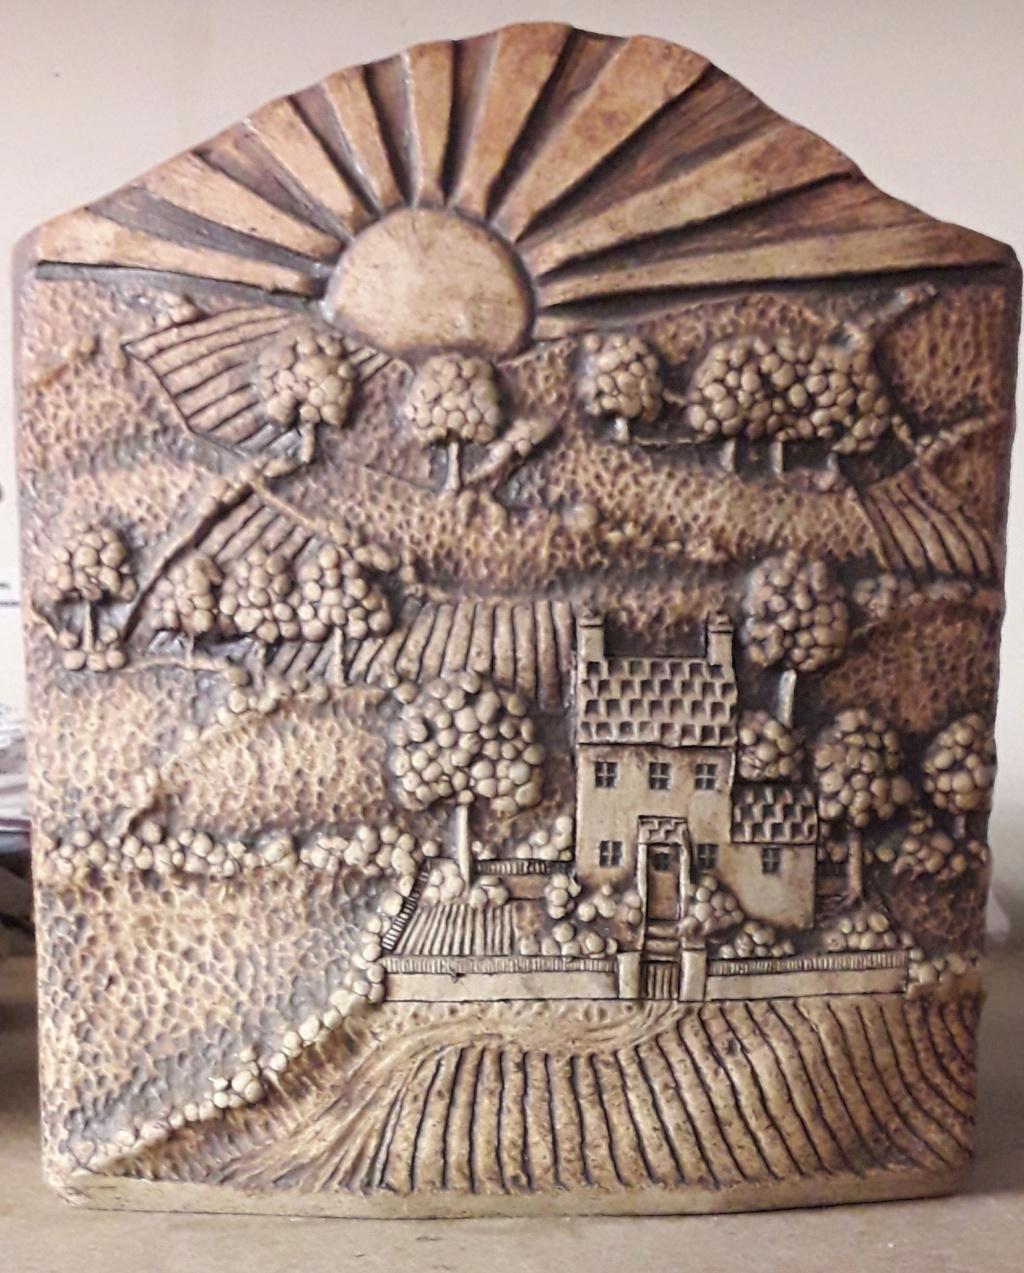 Large vase, tree mark - John Heath, Glasfryn Pottery, Wales  20200812